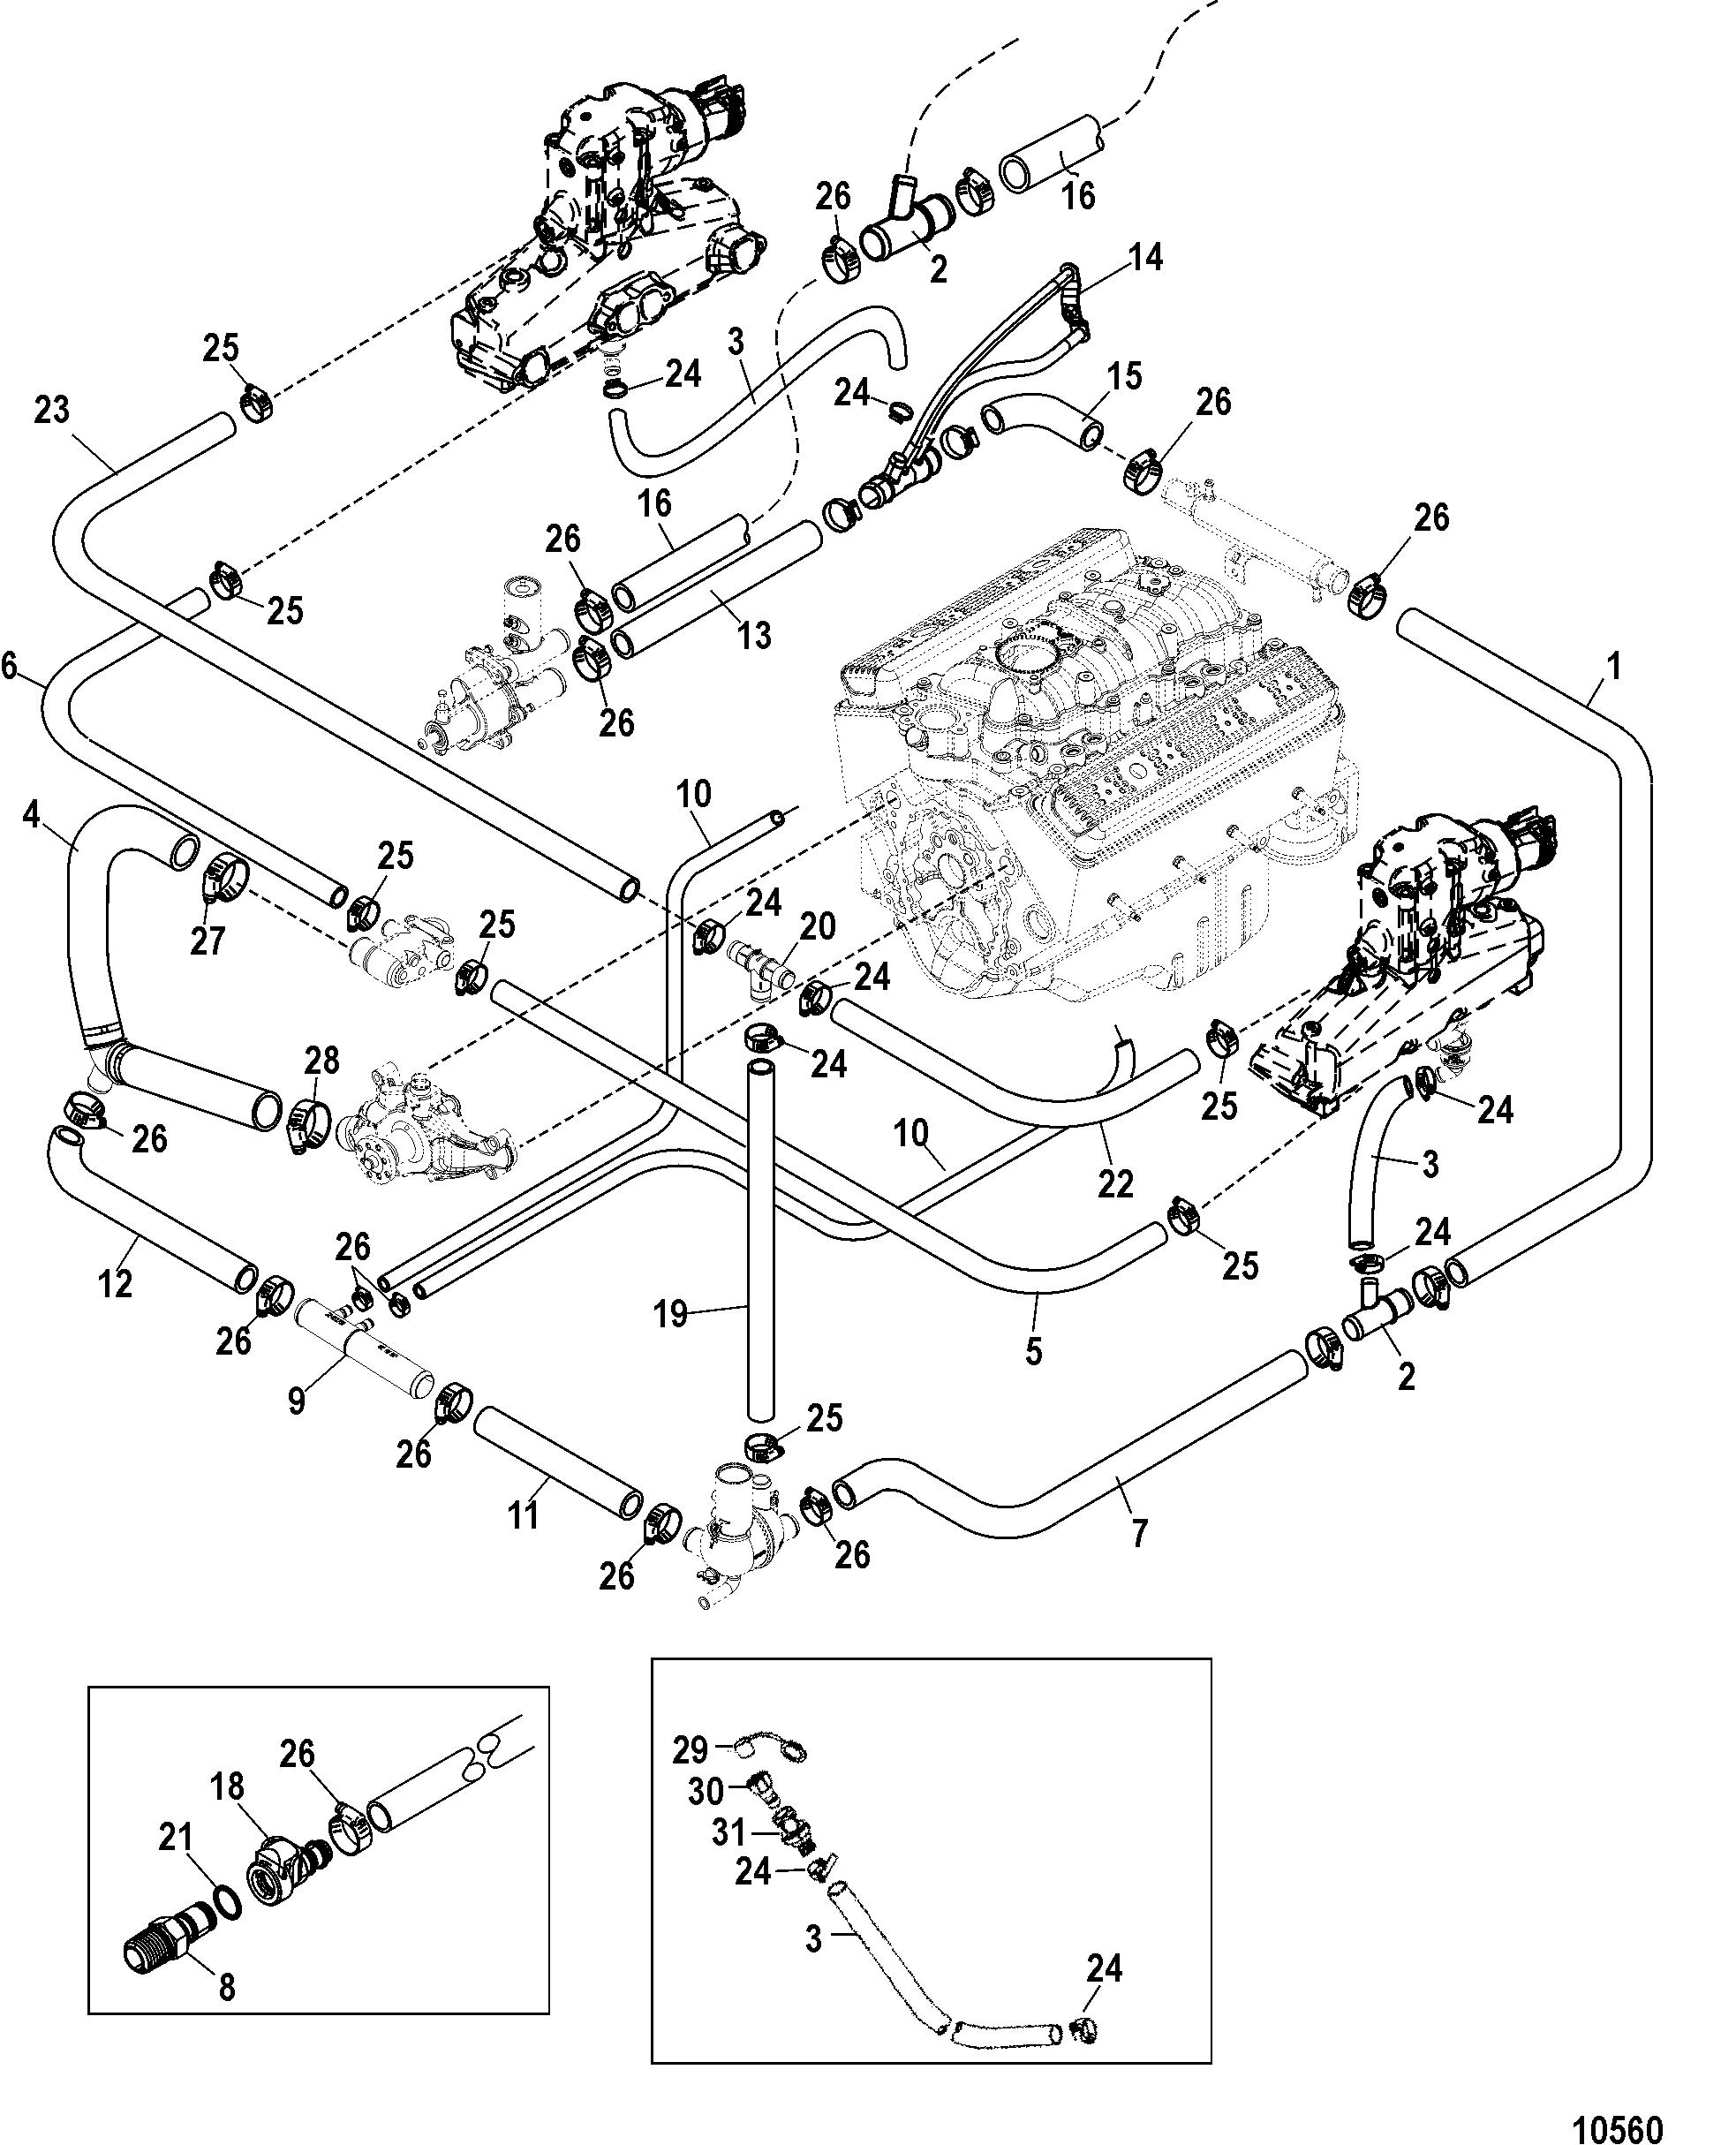 marine engine cooling system flow diagram marine free engine image for user manual